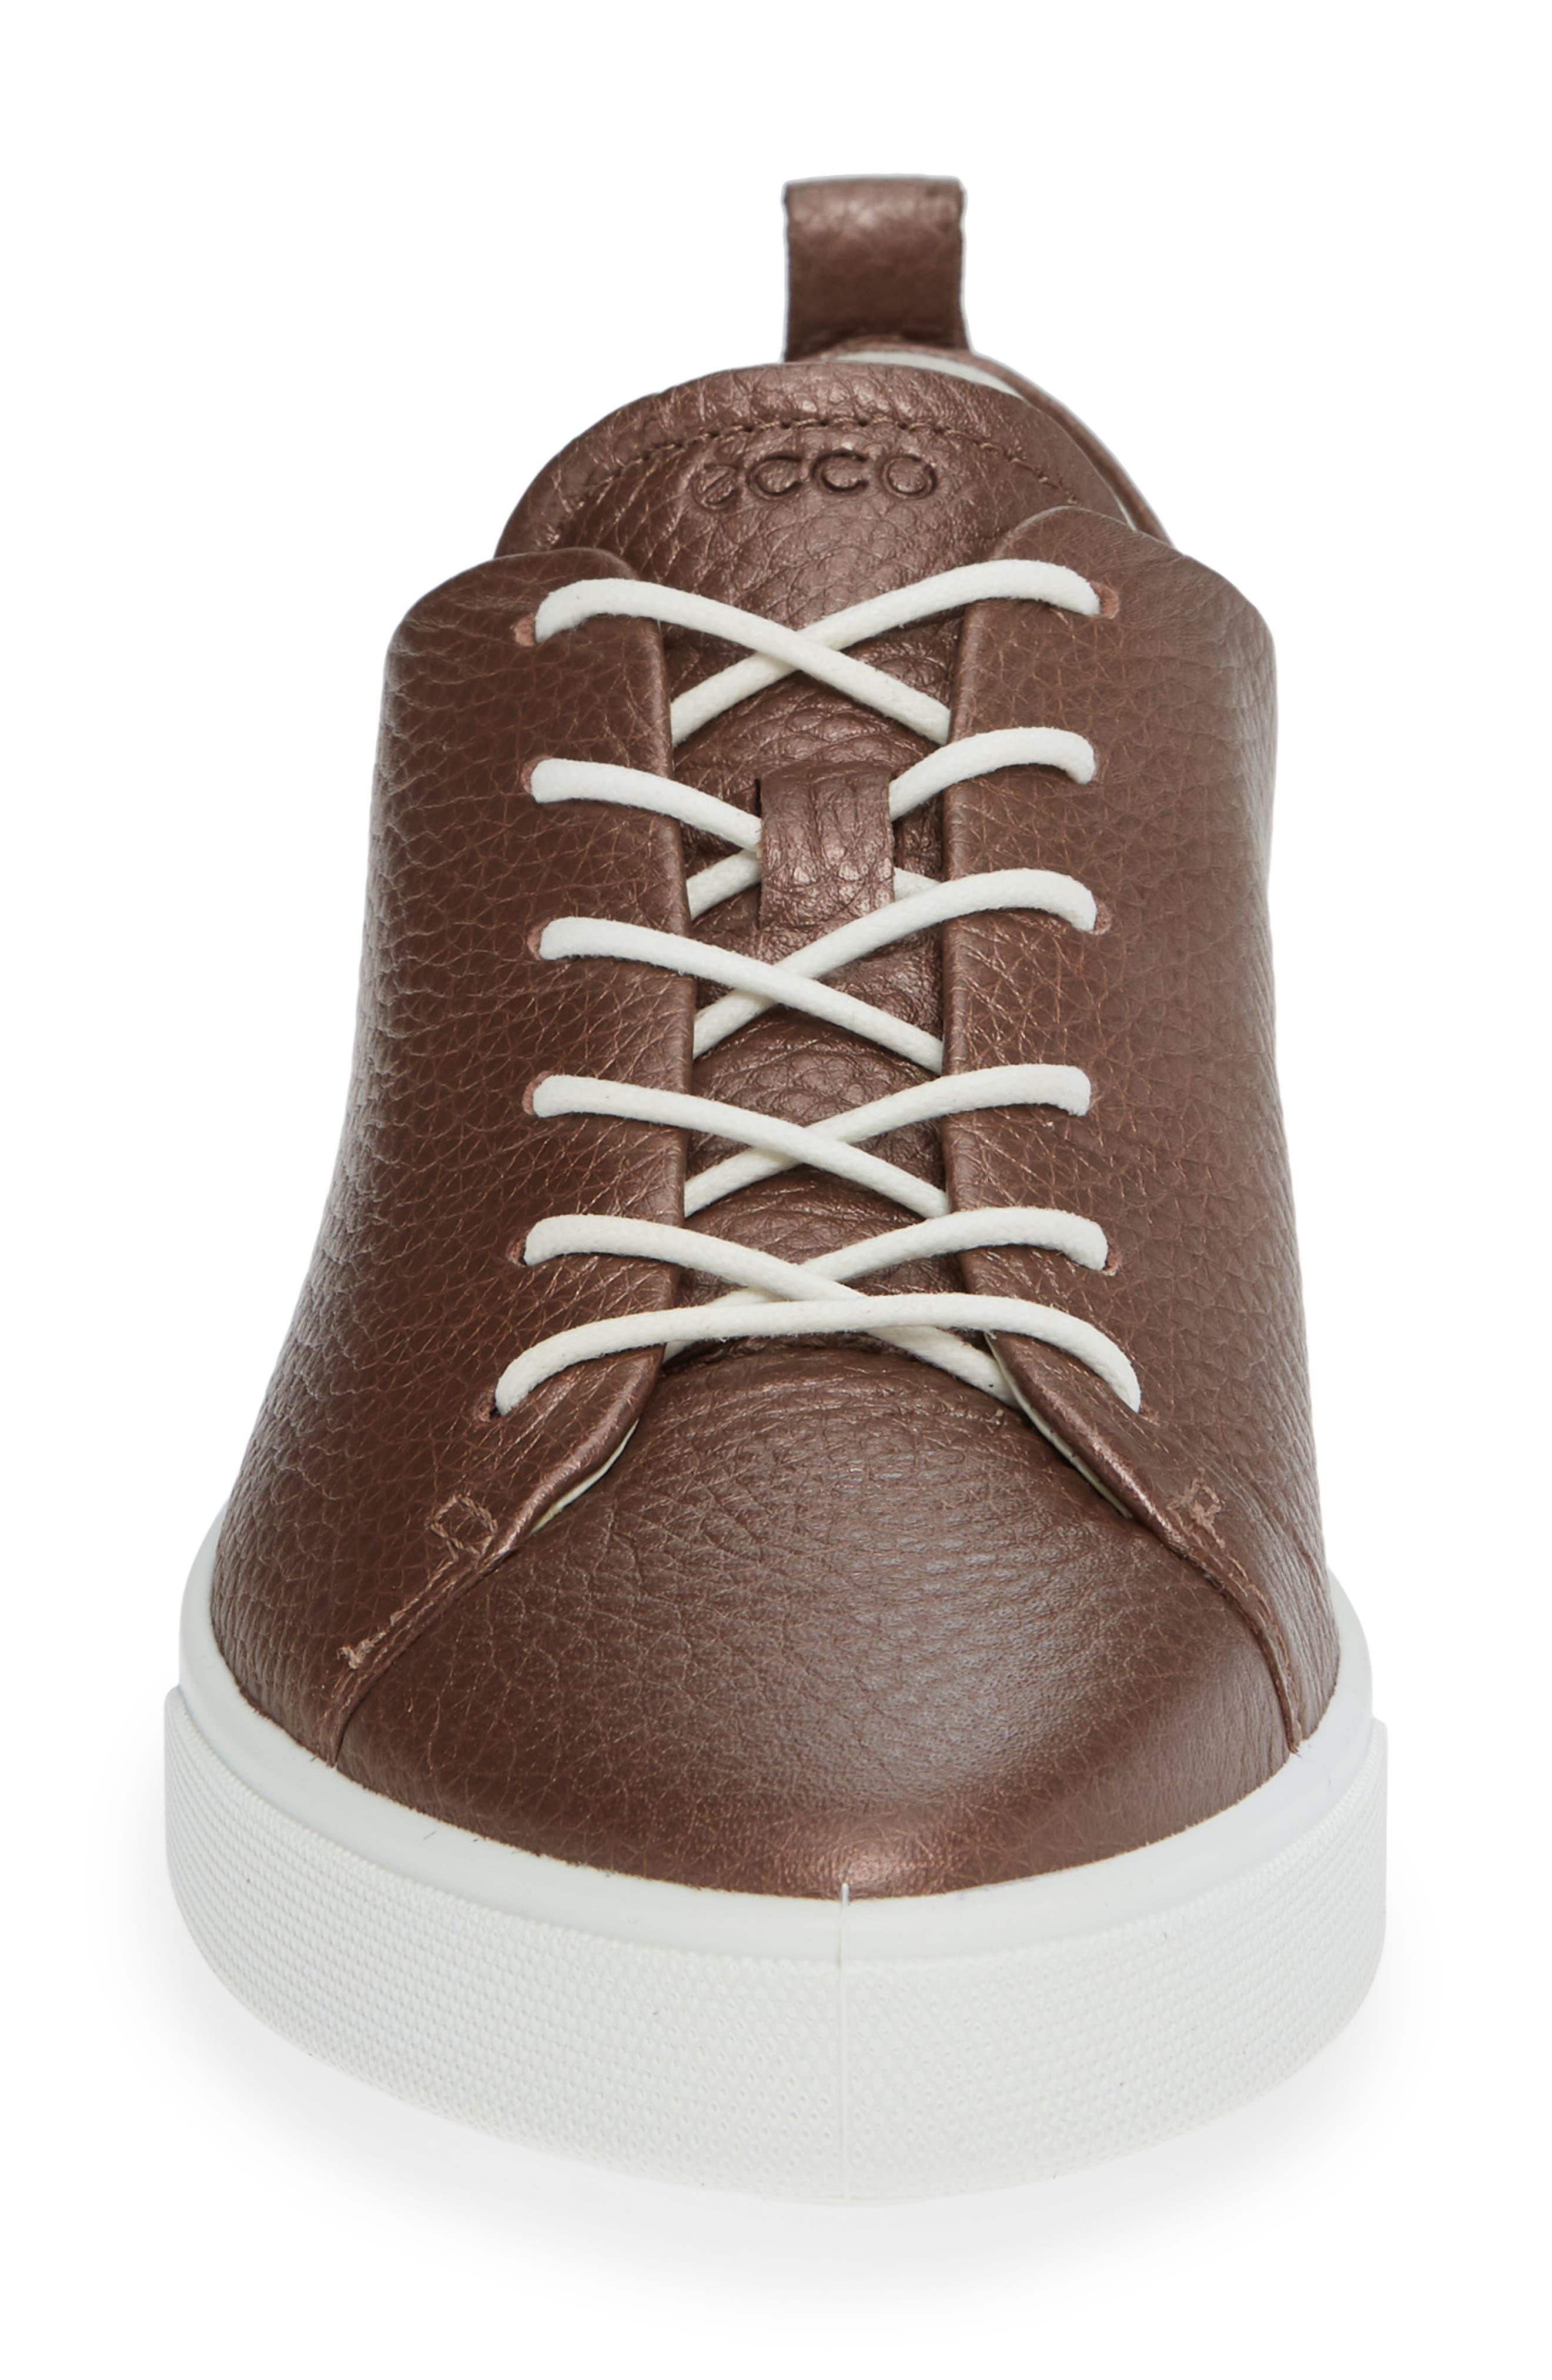 Gillian Sneaker,                             Alternate thumbnail 4, color,                             DEEP TAUPE/ BRONZE LEATHER